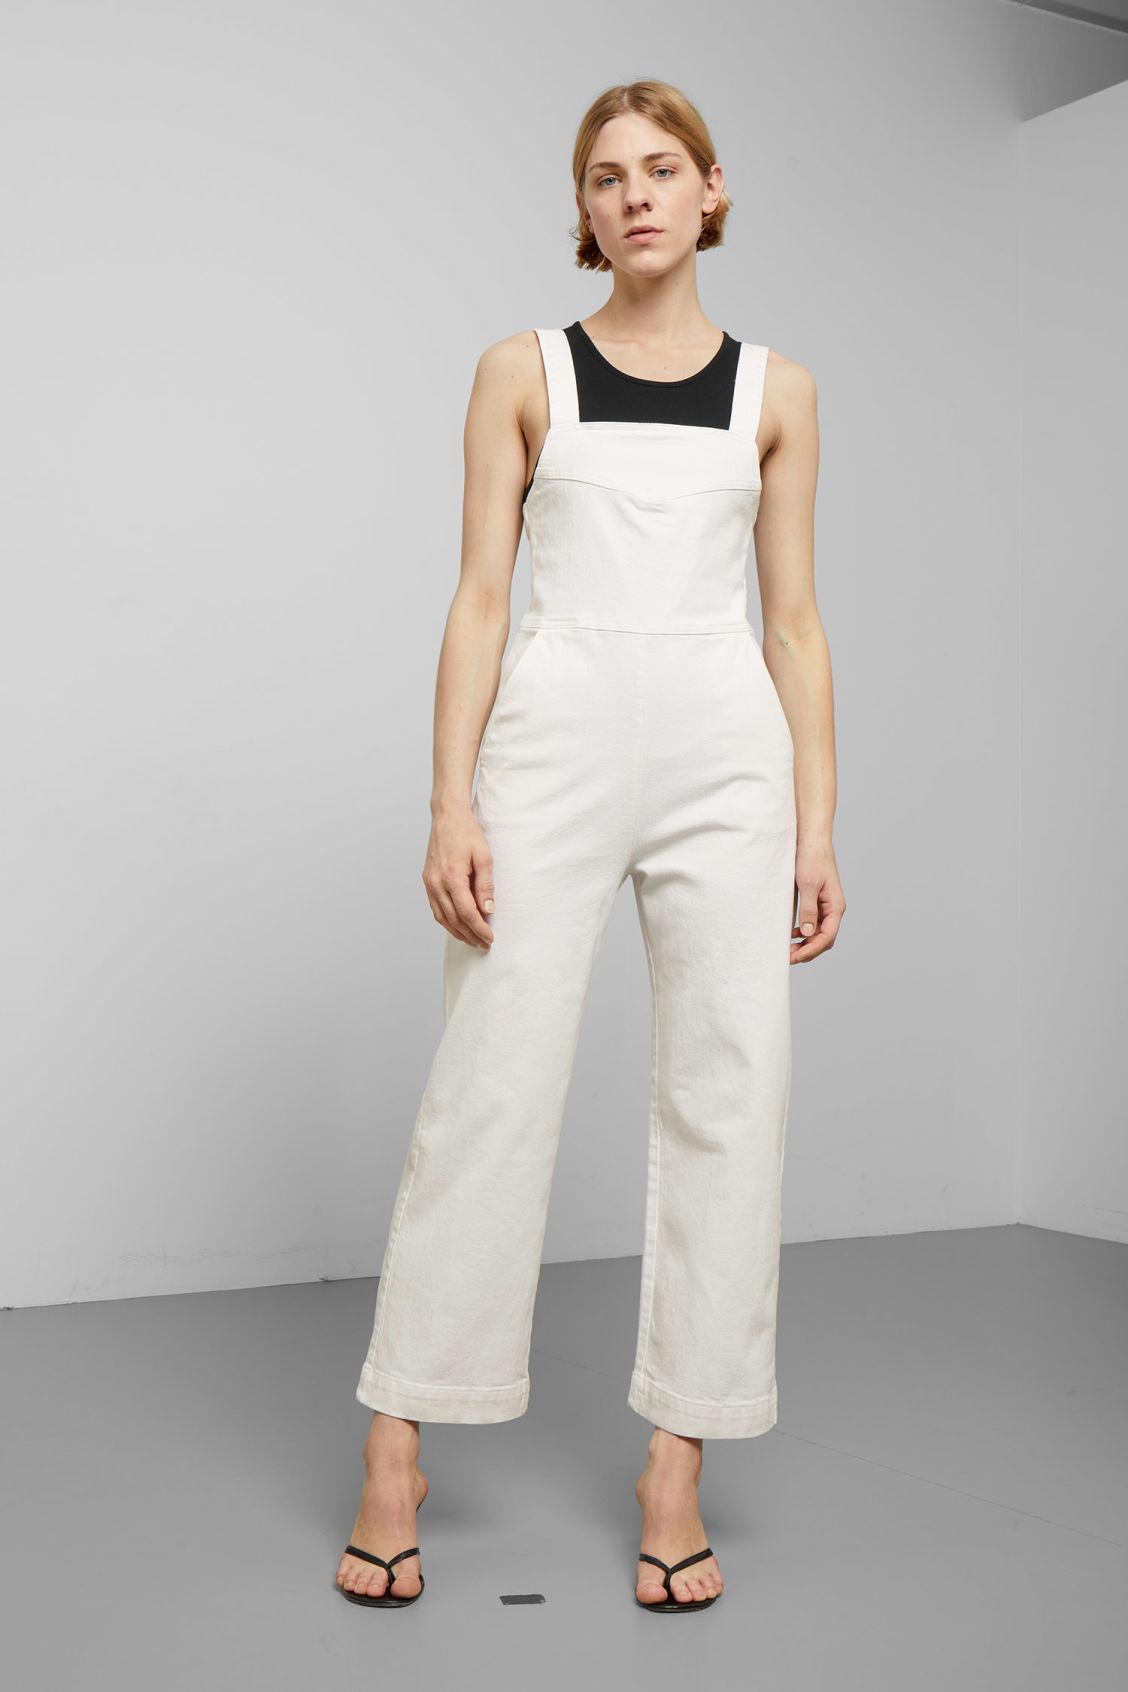 d6866be9b3 Junip White Denim Jumpsuit - White - Dresses   Jumpsuits - Weekday